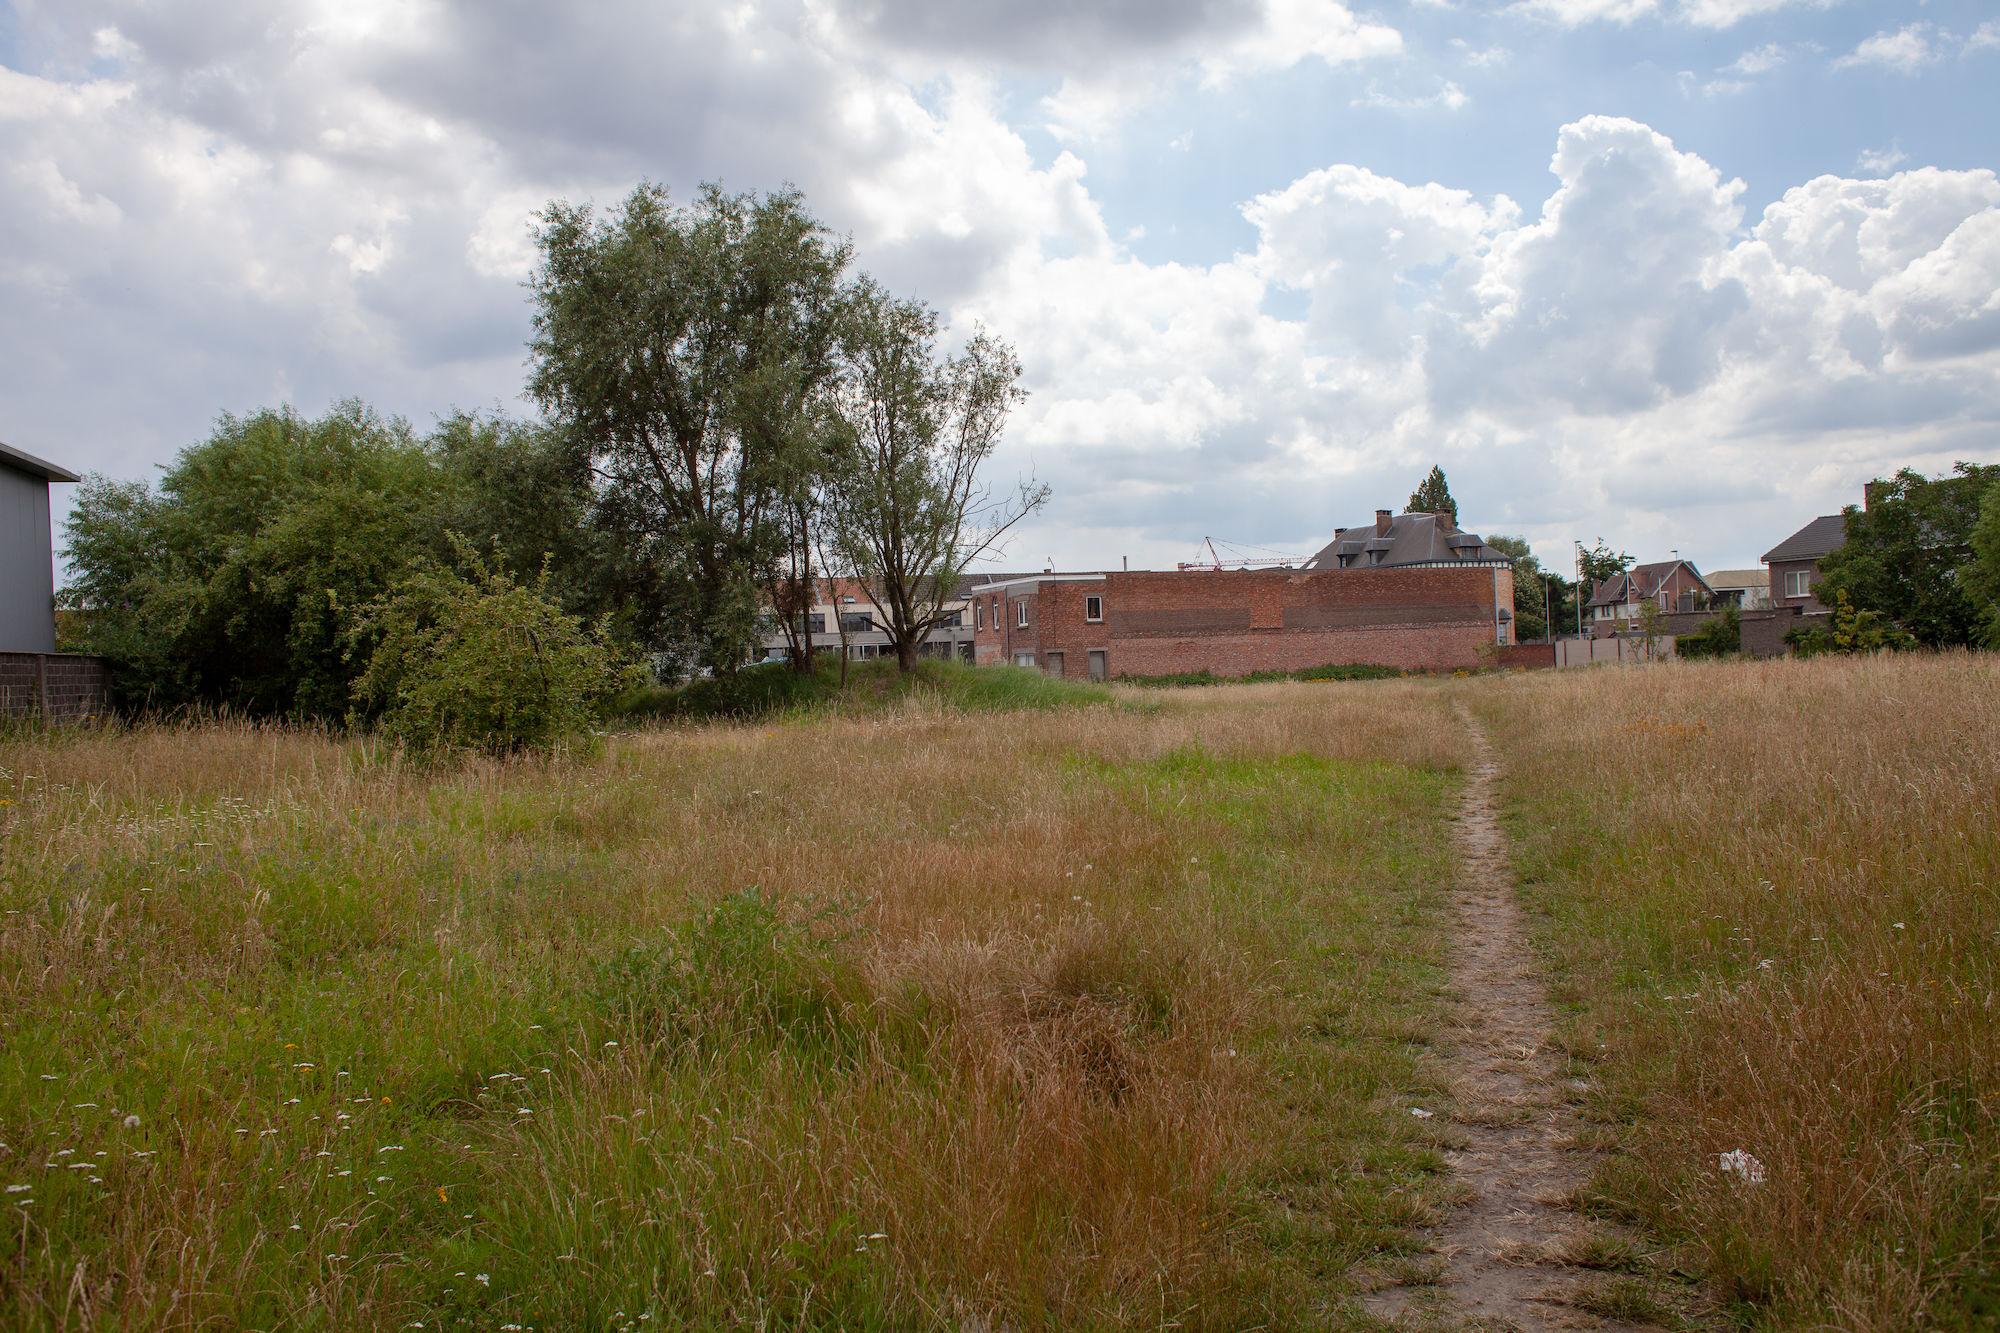 2019-07-02 Muide Meulestede prospectie Wannes_stadsvernieuwing_IMG_0343-3.jpg